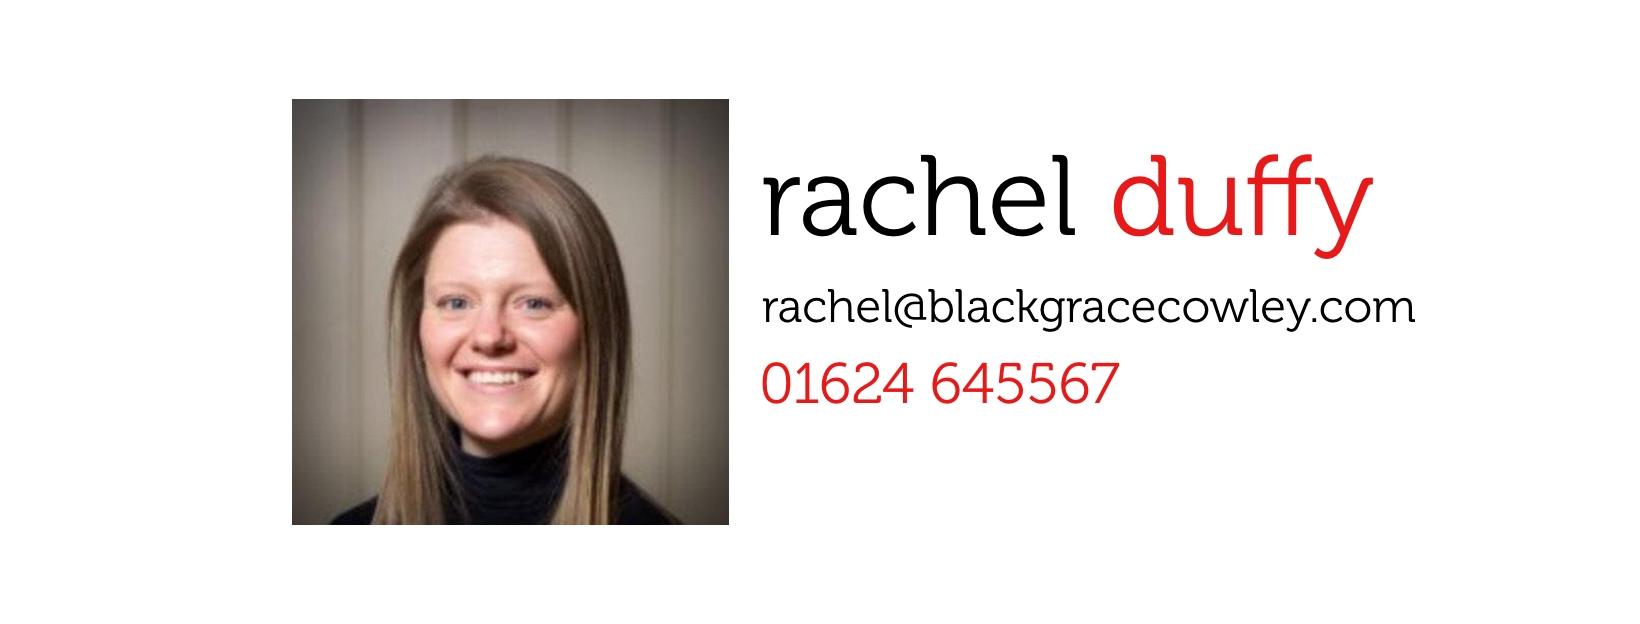 Everyone, meet Rachel!